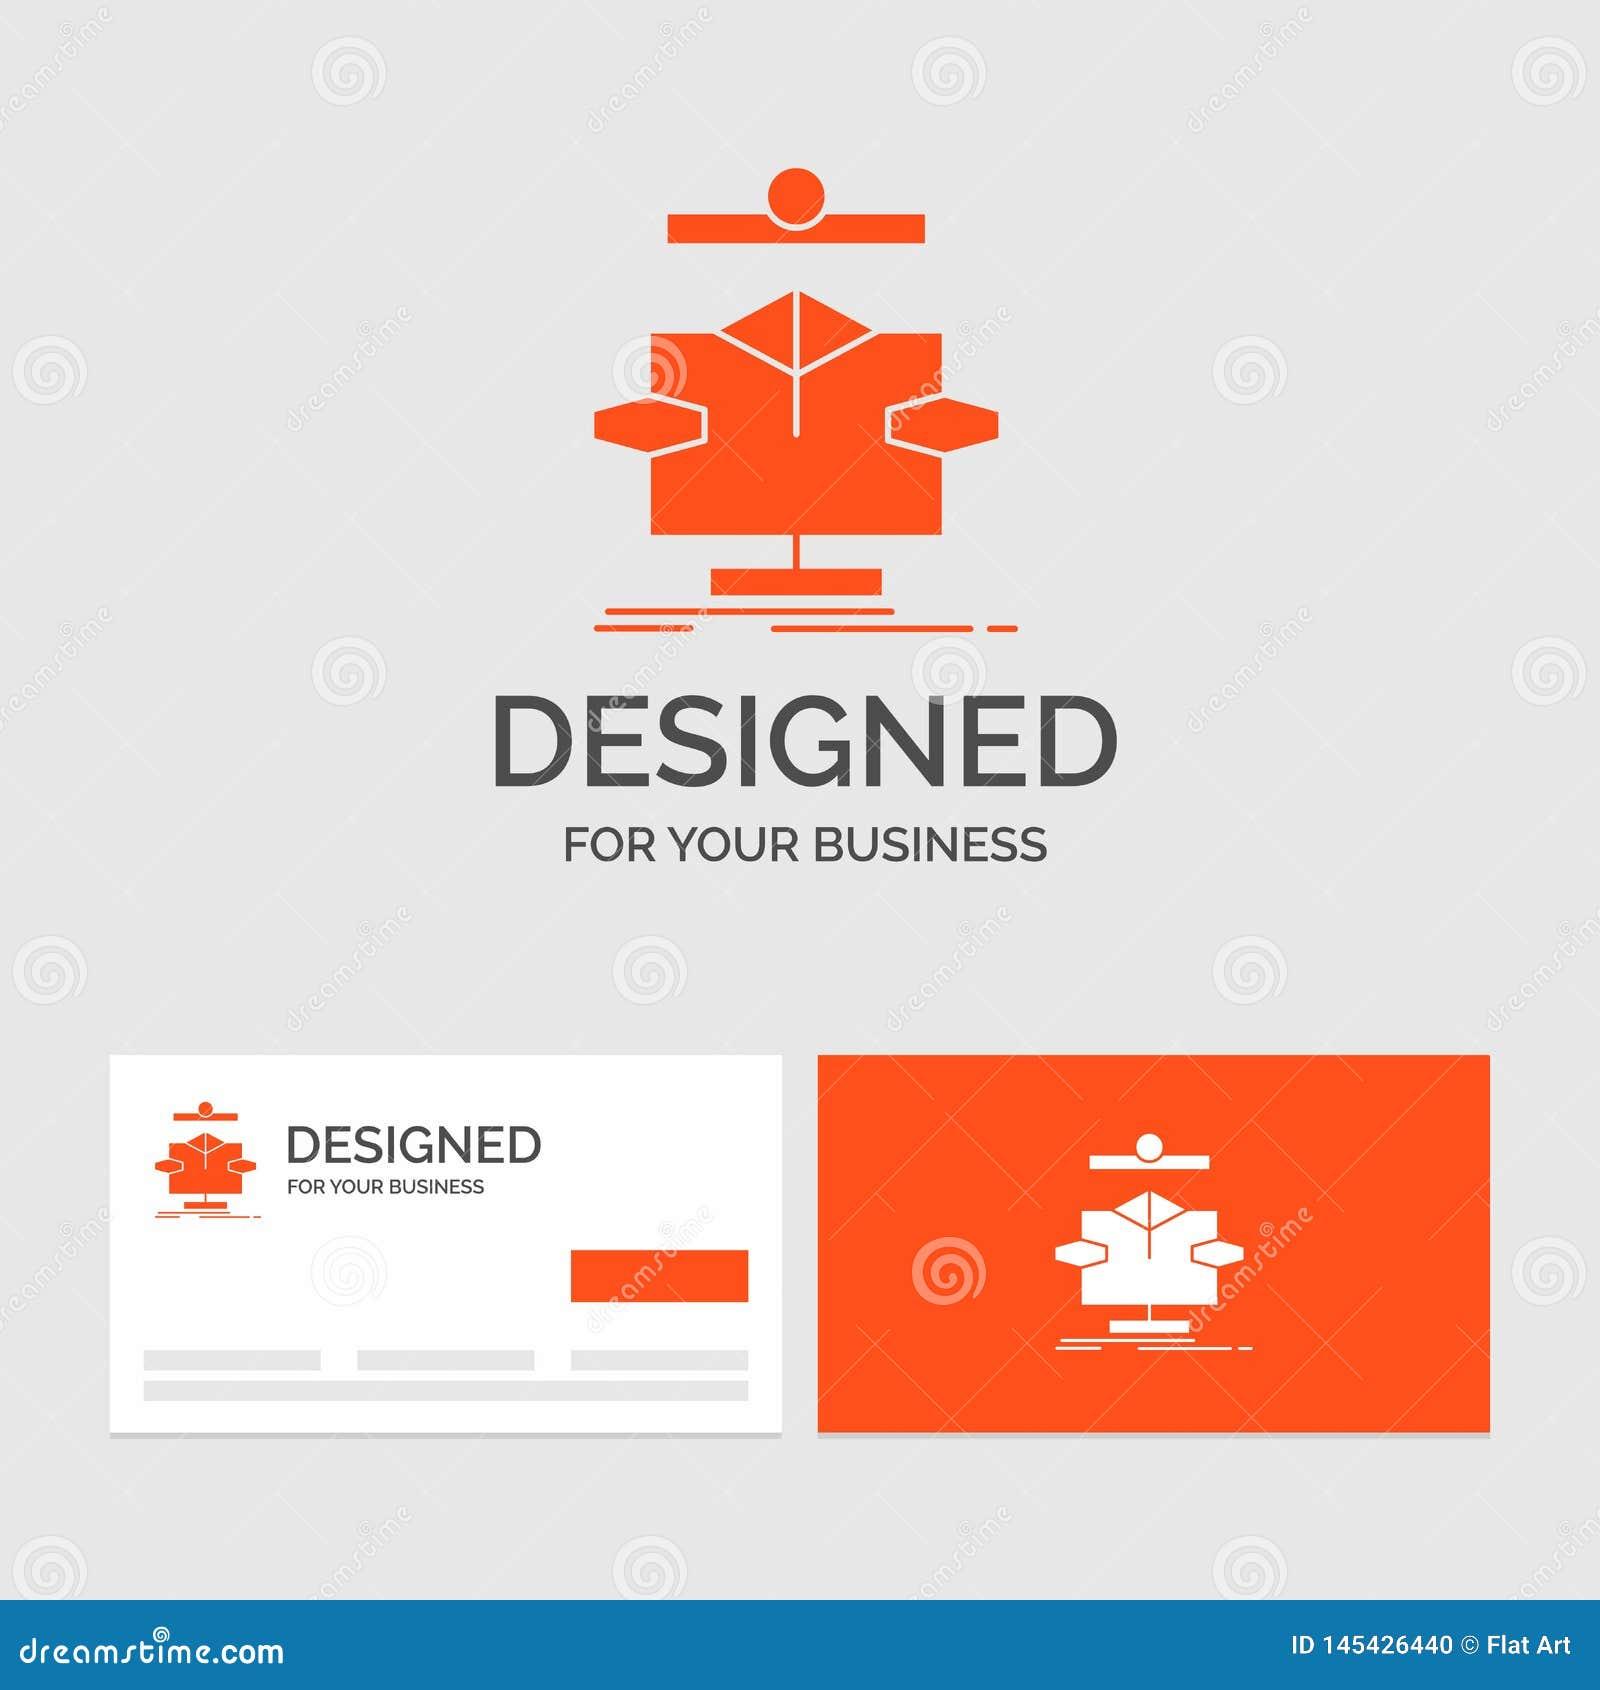 Molde do logotipo do negócio para o algoritmo, carta, dados, diagrama, fluxo Cart?es de visita alaranjados com molde do logotipo